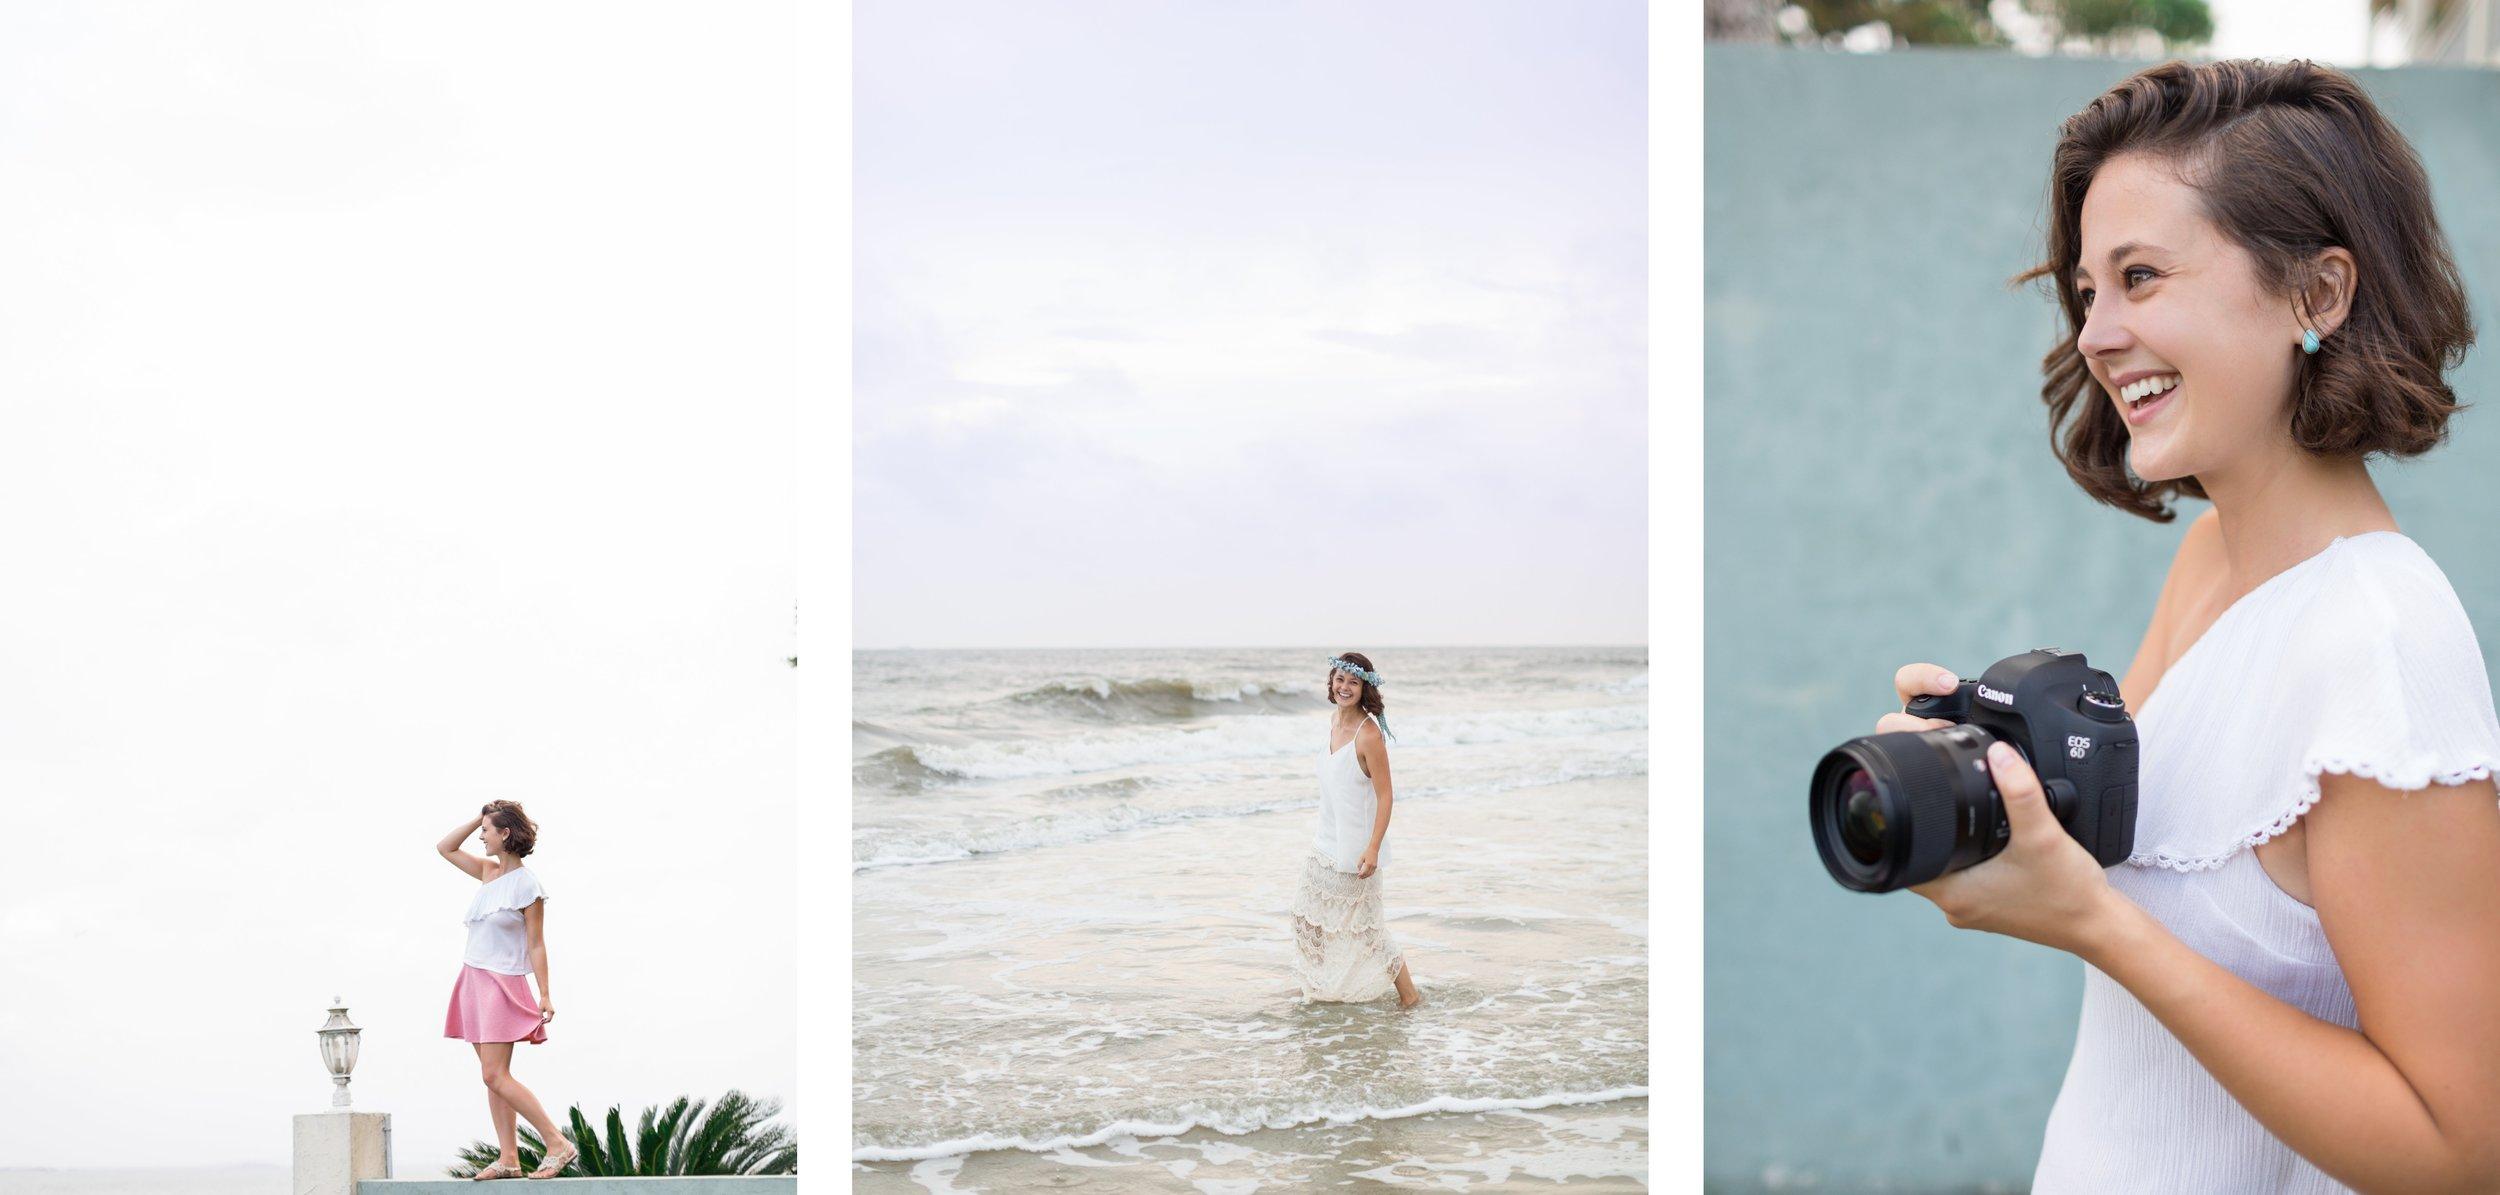 Rainey_Gregg_Photography_St._Simons_Island_Georgia_California_Wedding_Portrait_Photography_0247.jpg